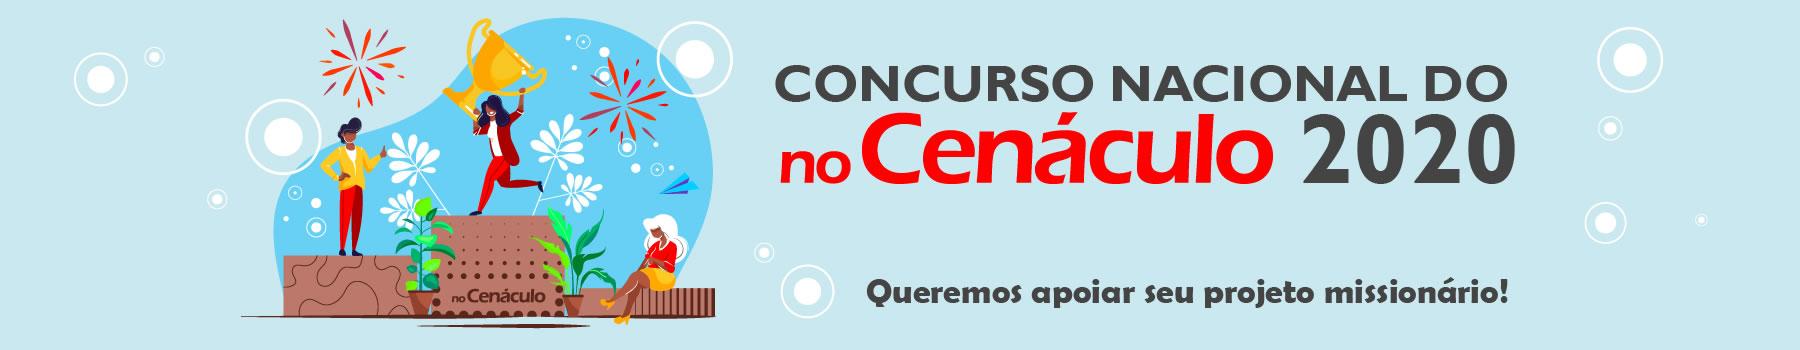 Concurso Nacional do no Cenáculo 2020